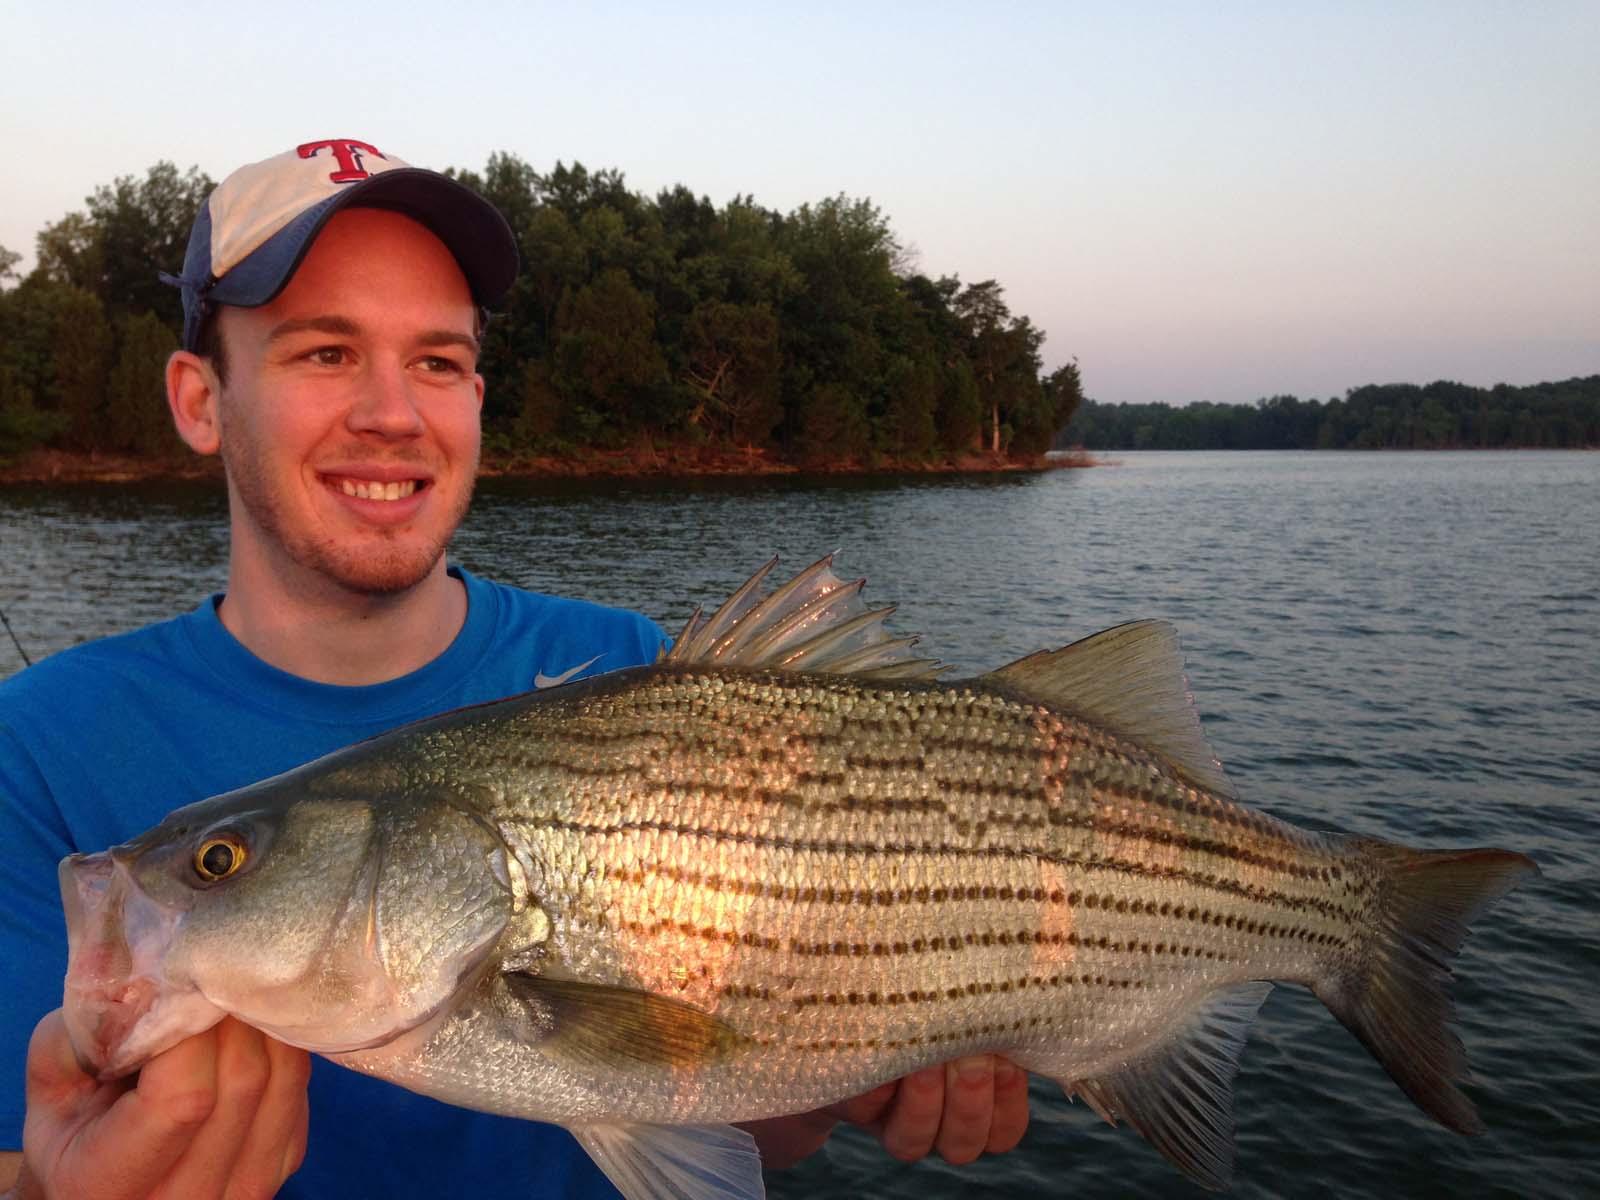 Nashville fishing charters 2 nashville fishing charters for Tims ford lake fishing report